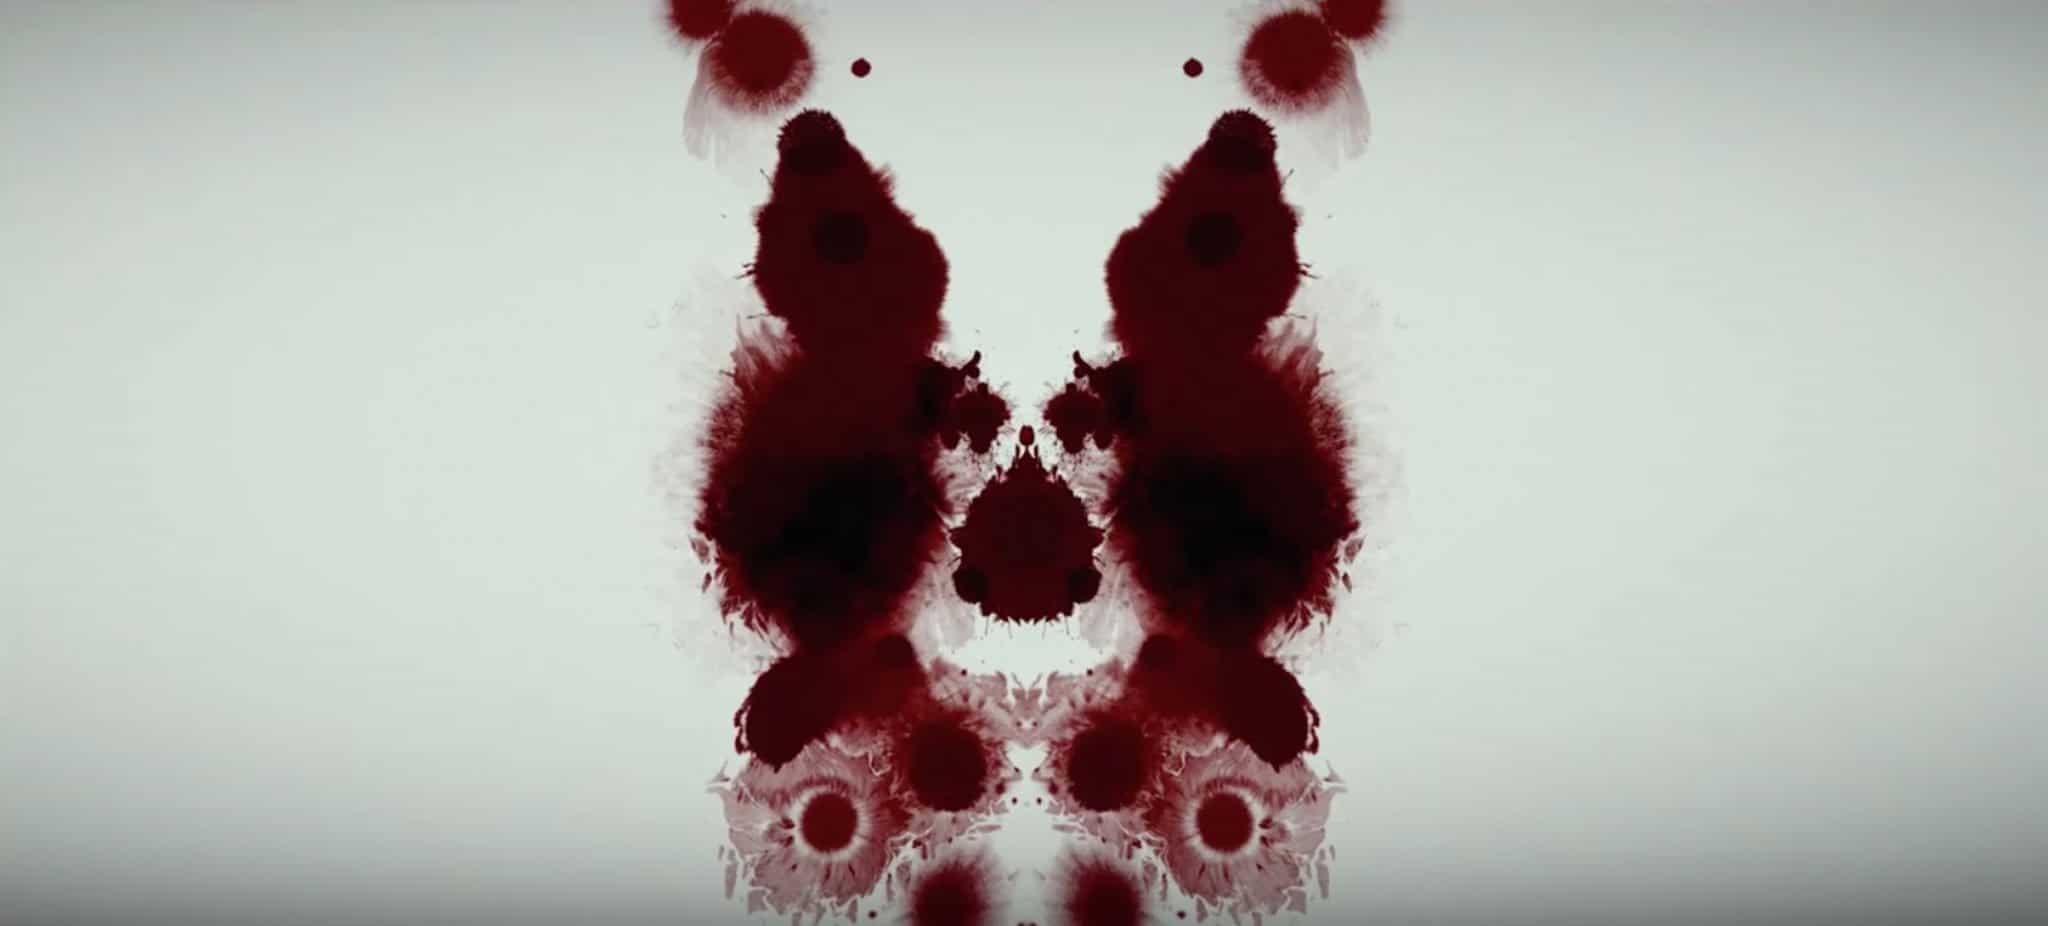 Mindhunter la nuova serie TV Netflix